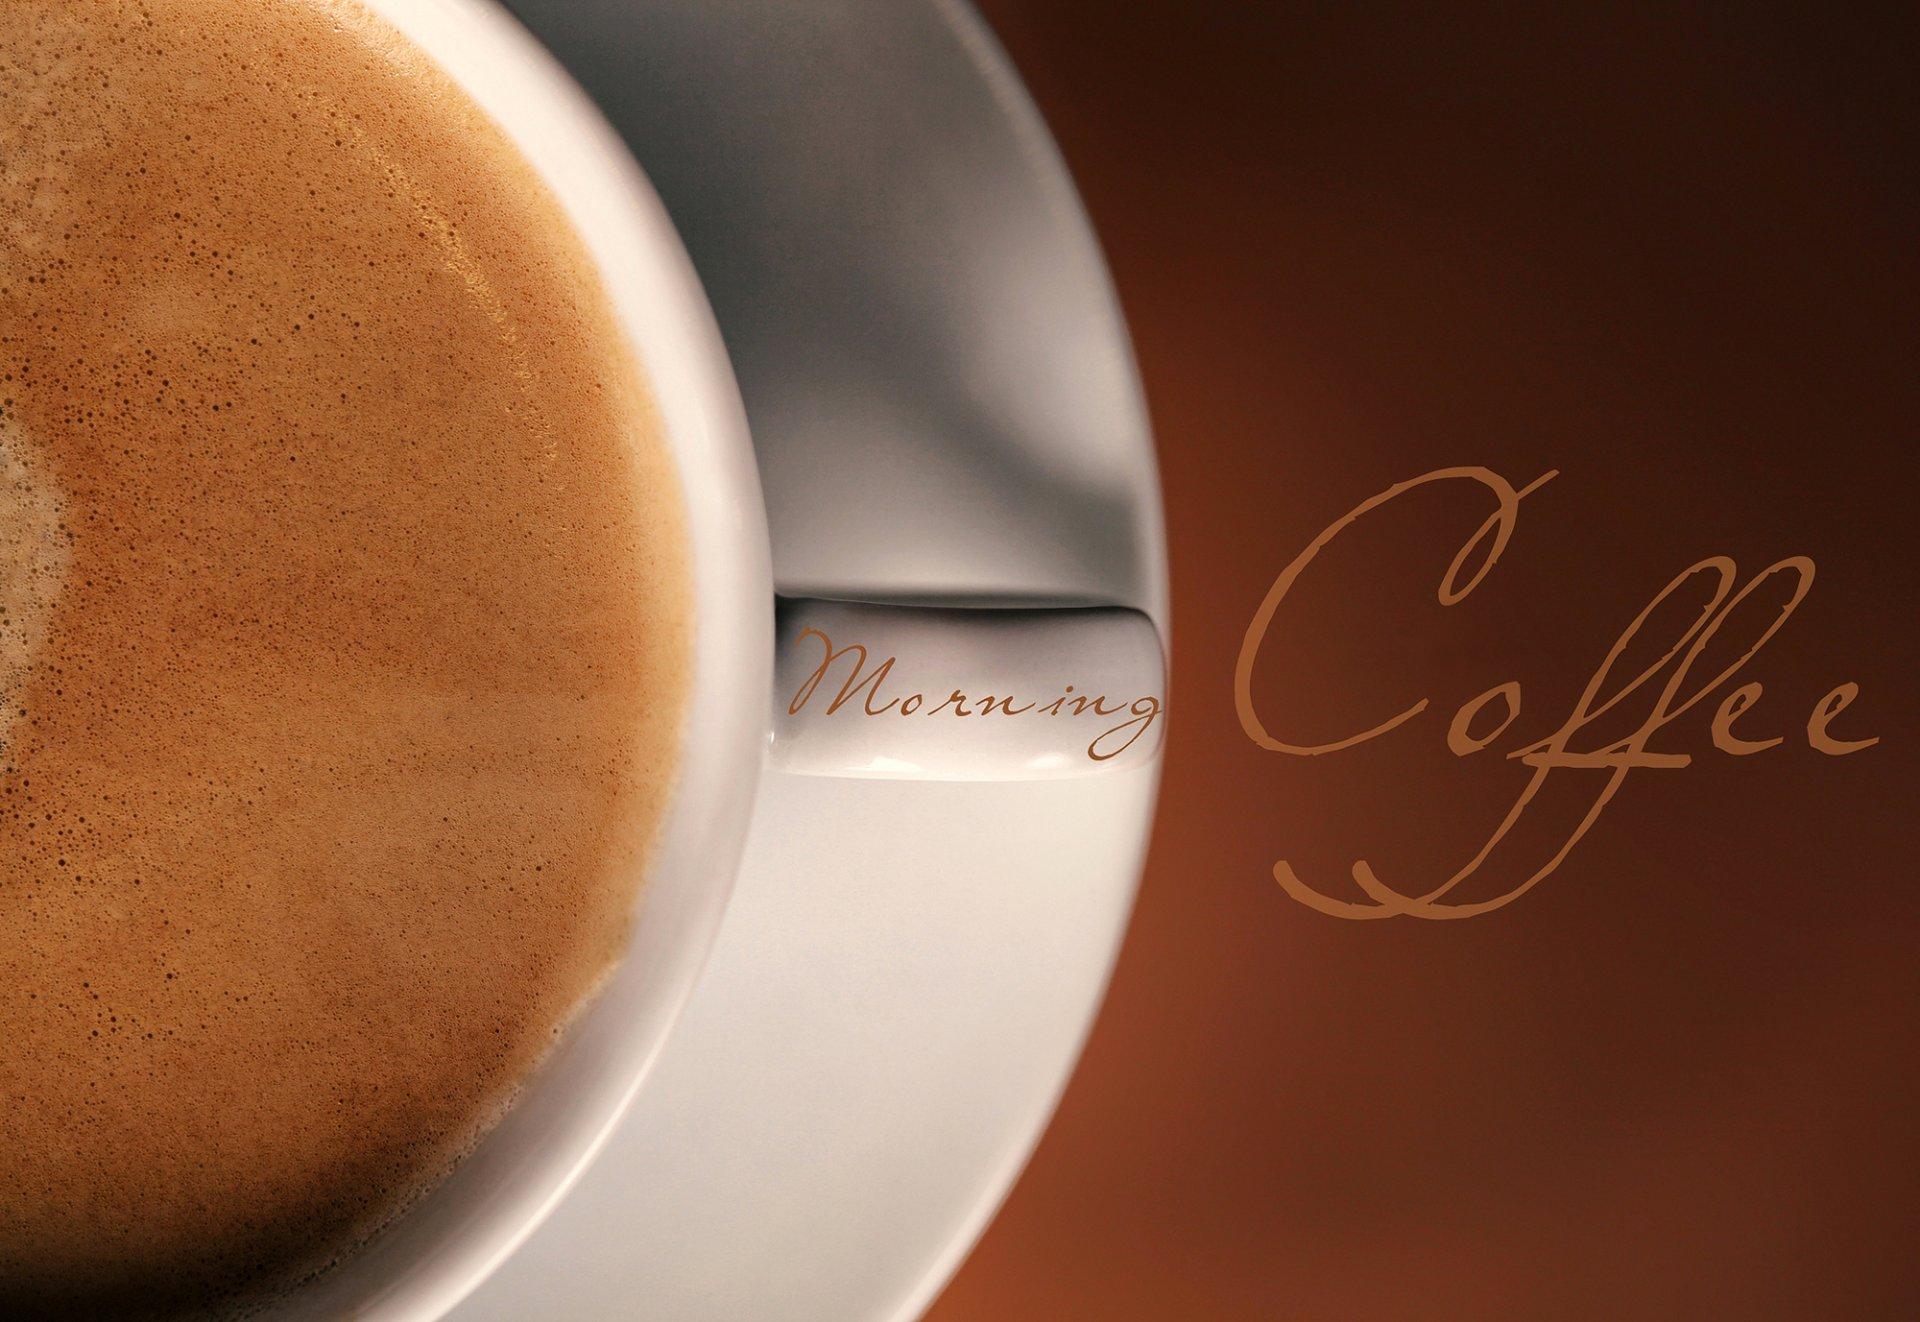 картинки и обои утро кофе чтобы